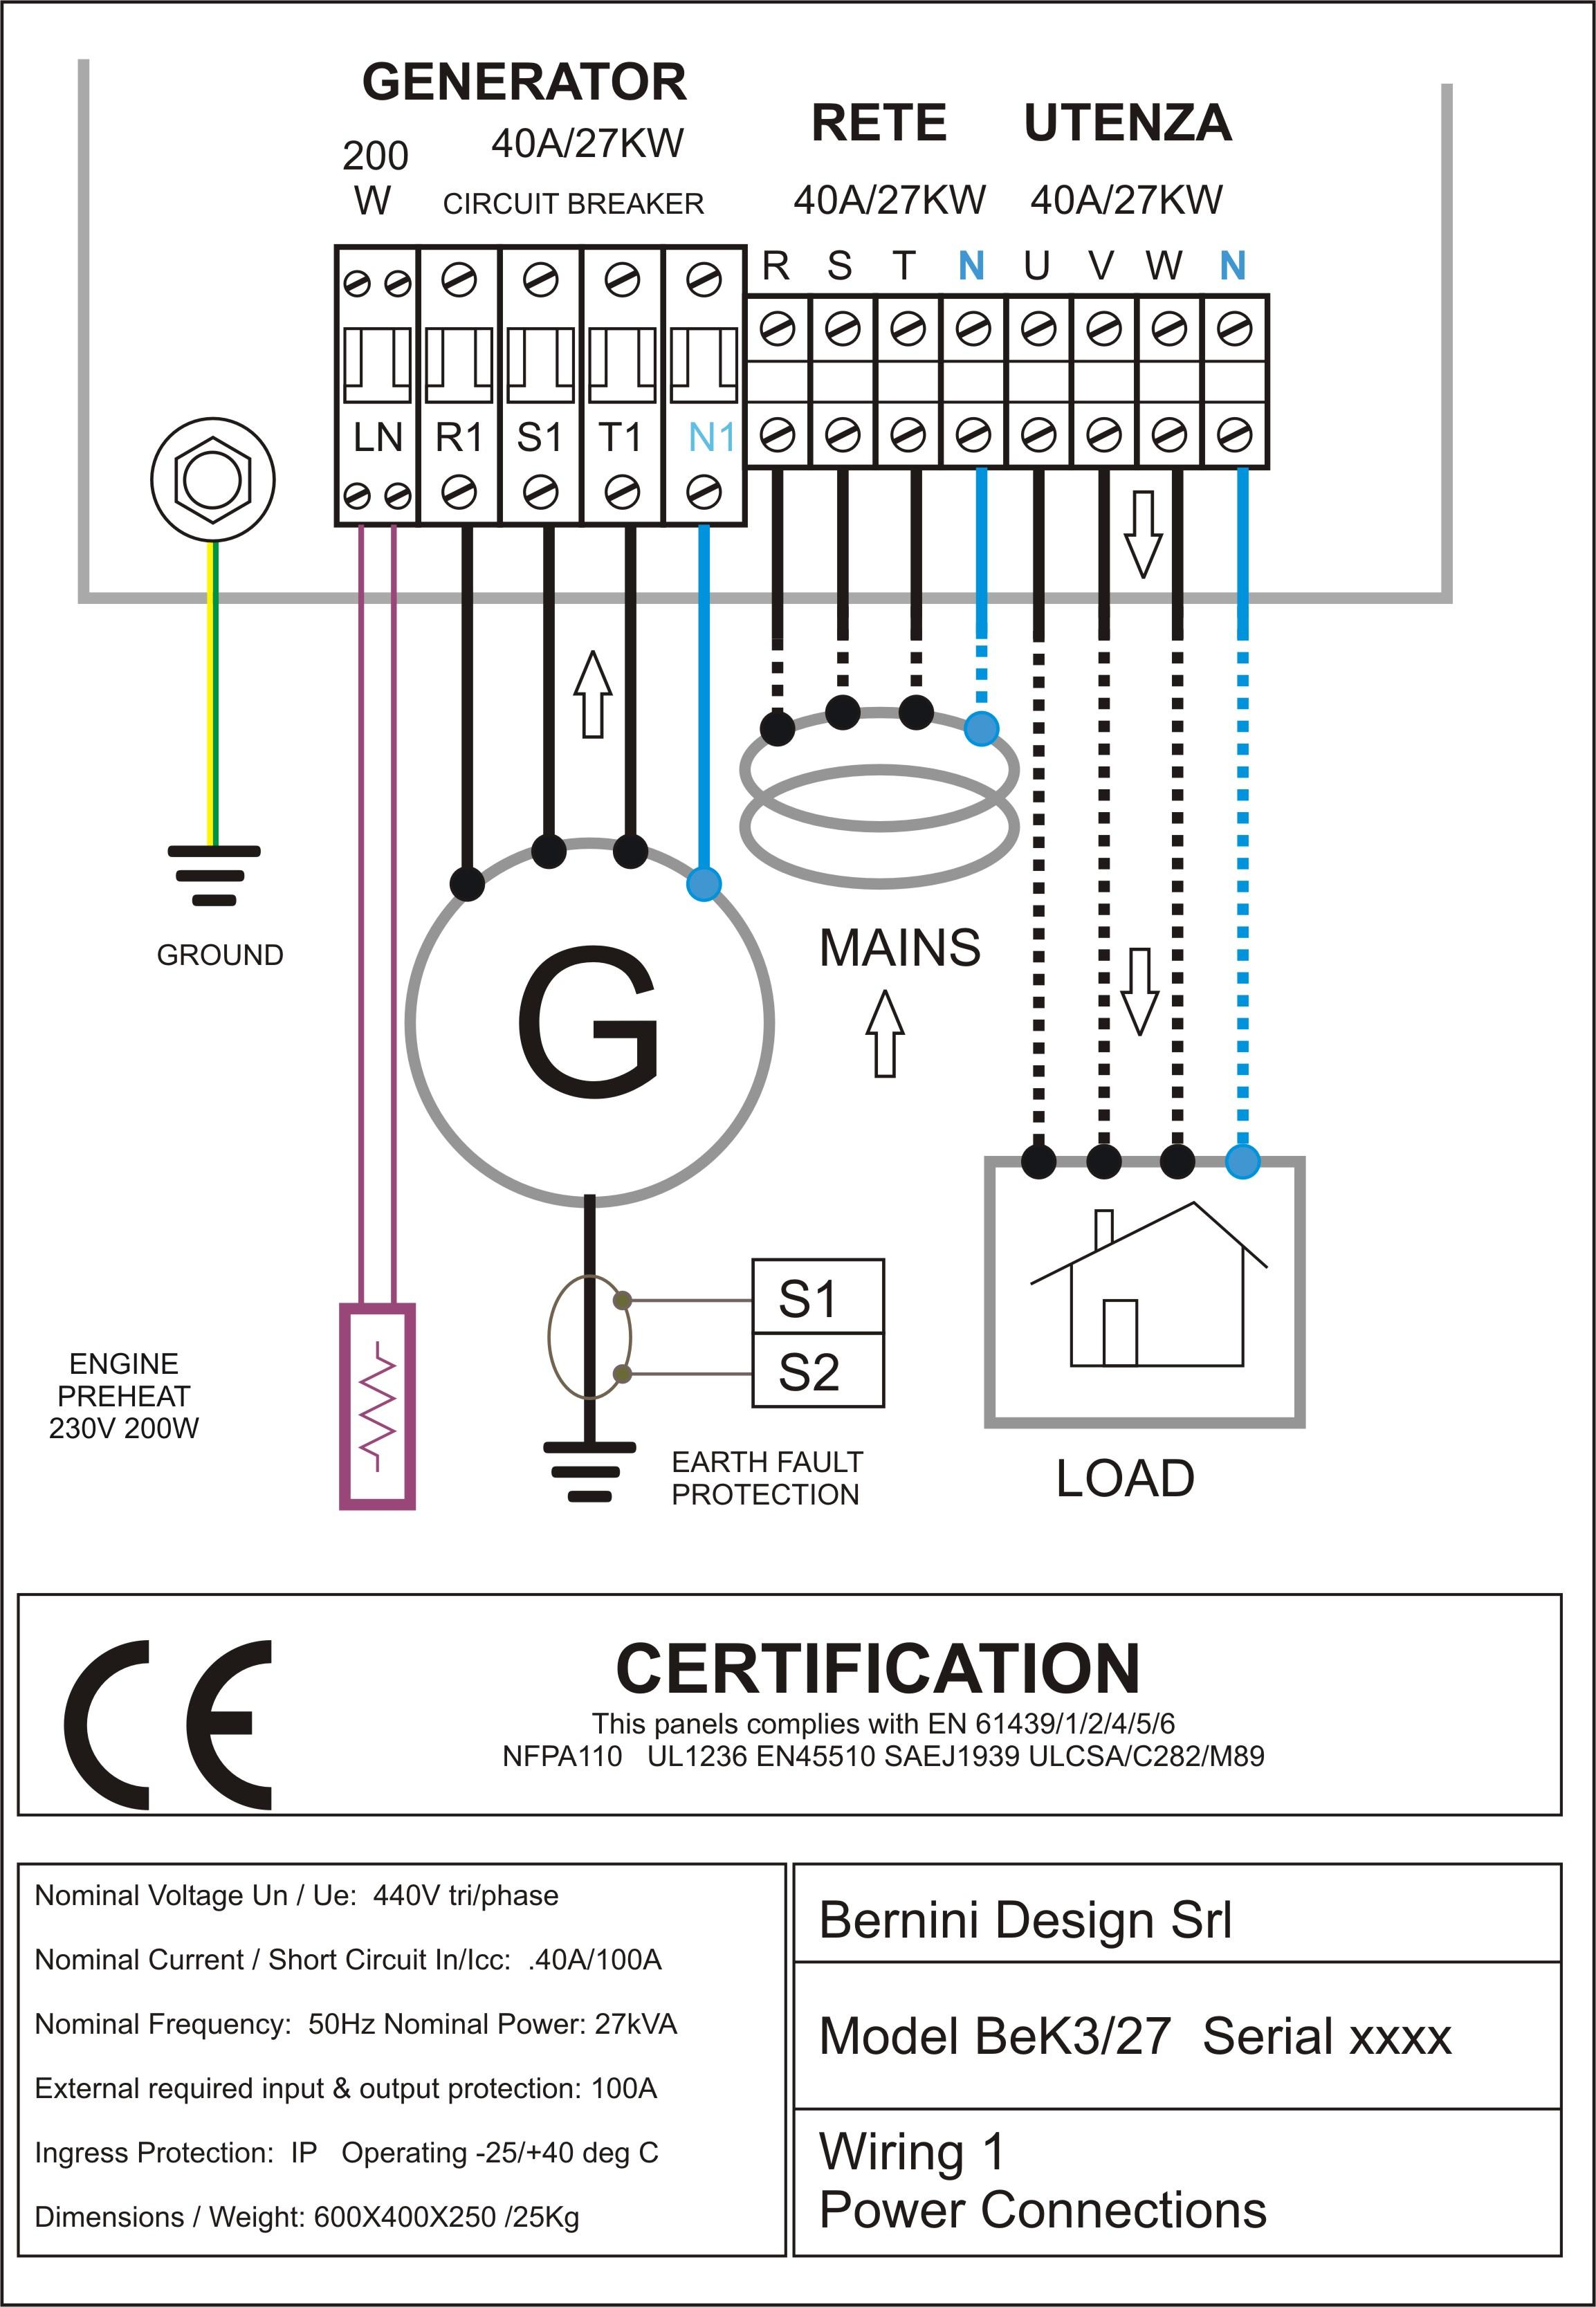 Ignition wiring diagram kohler free image about wiring diagram - Kohler Generators 50 Wiring Schematic Kohler Engine Diagram Diesel Generator Control Panel Wiring Diagram Ac Connections